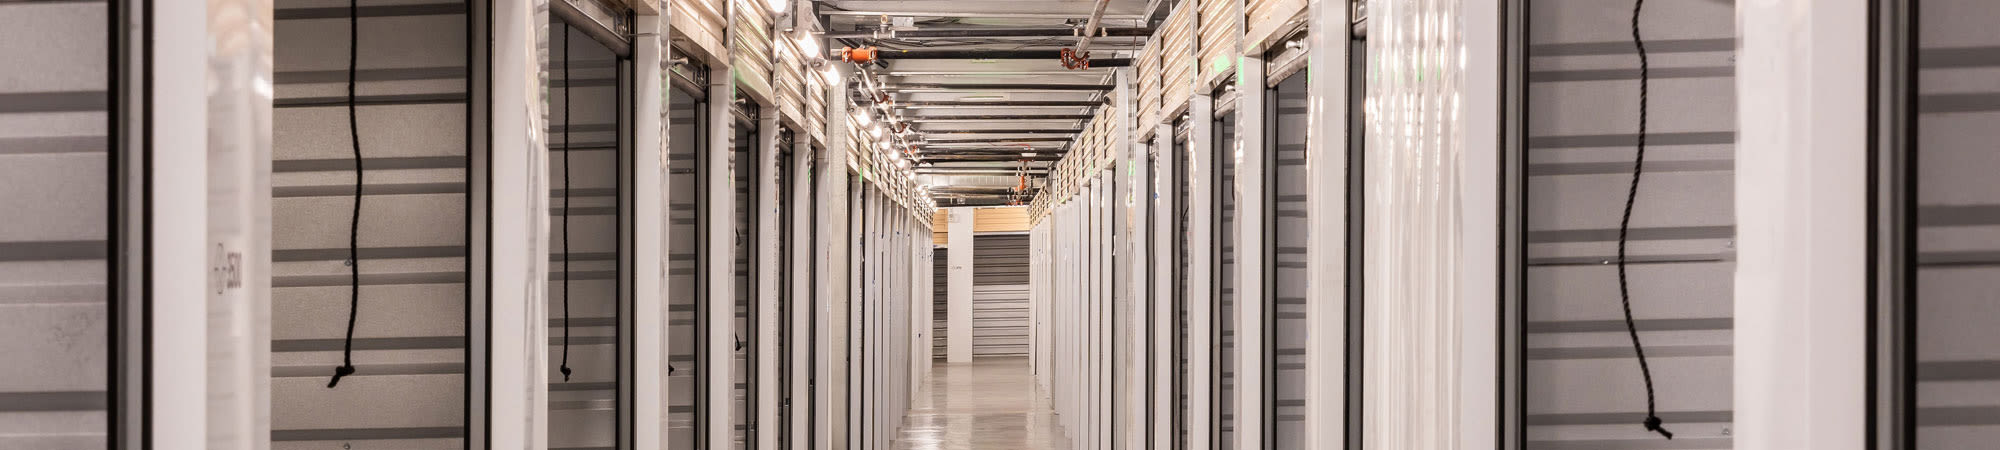 Temperature-controlled storage at Cubes Self Storage in Covington, Washington